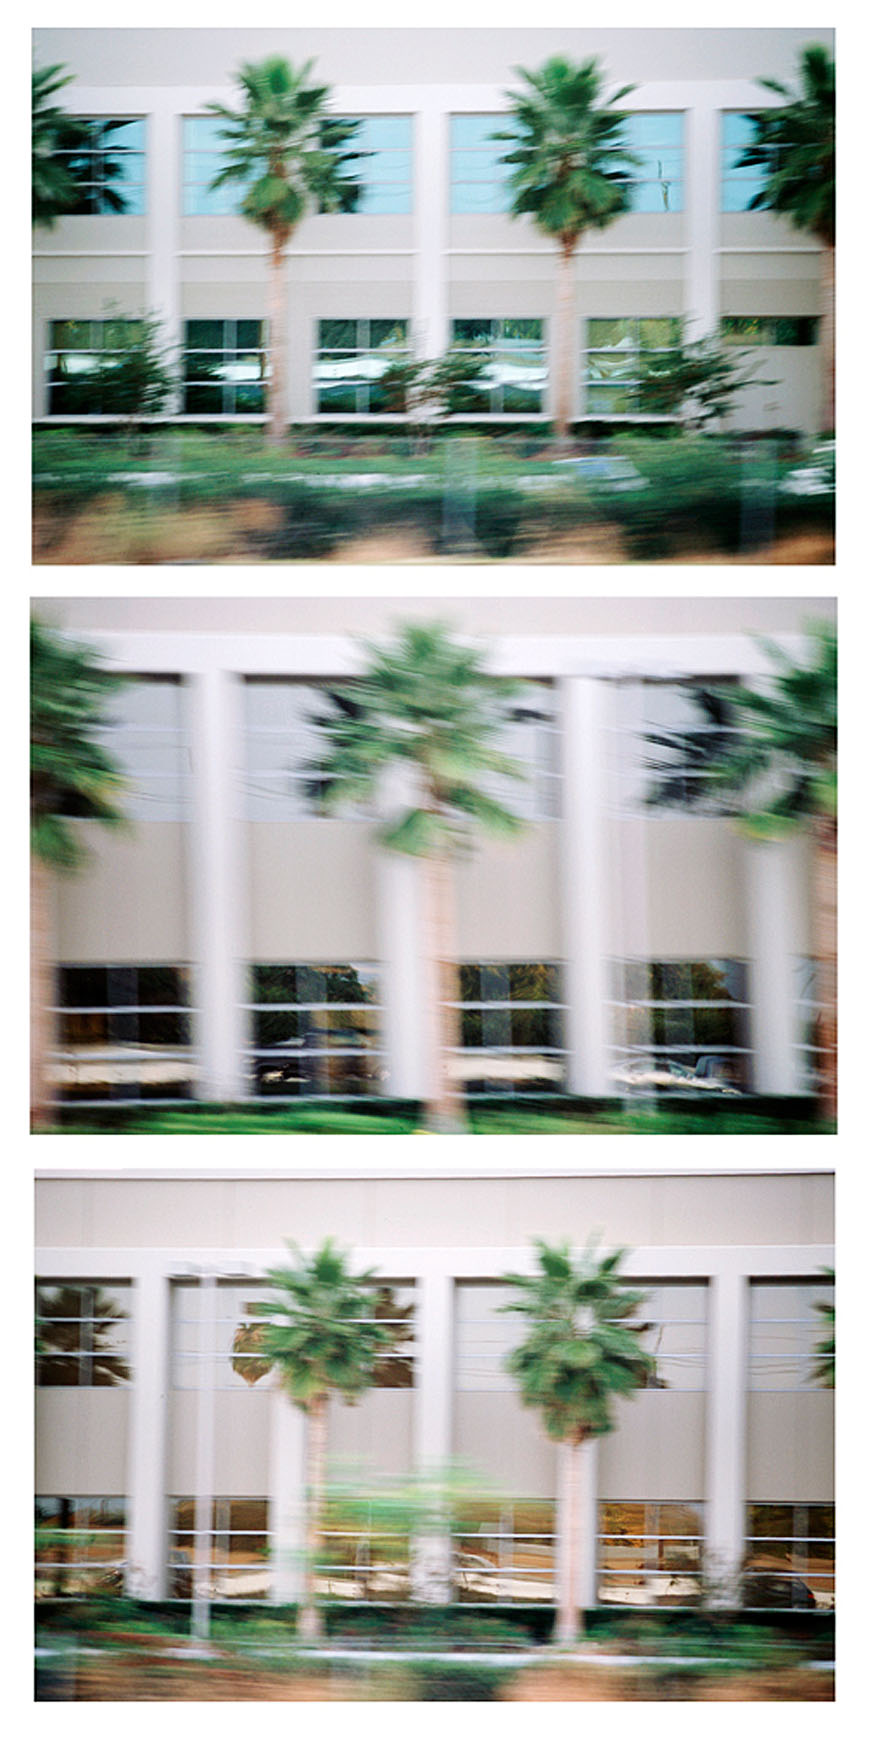 Palm Trees, I-880, San Jose, CA